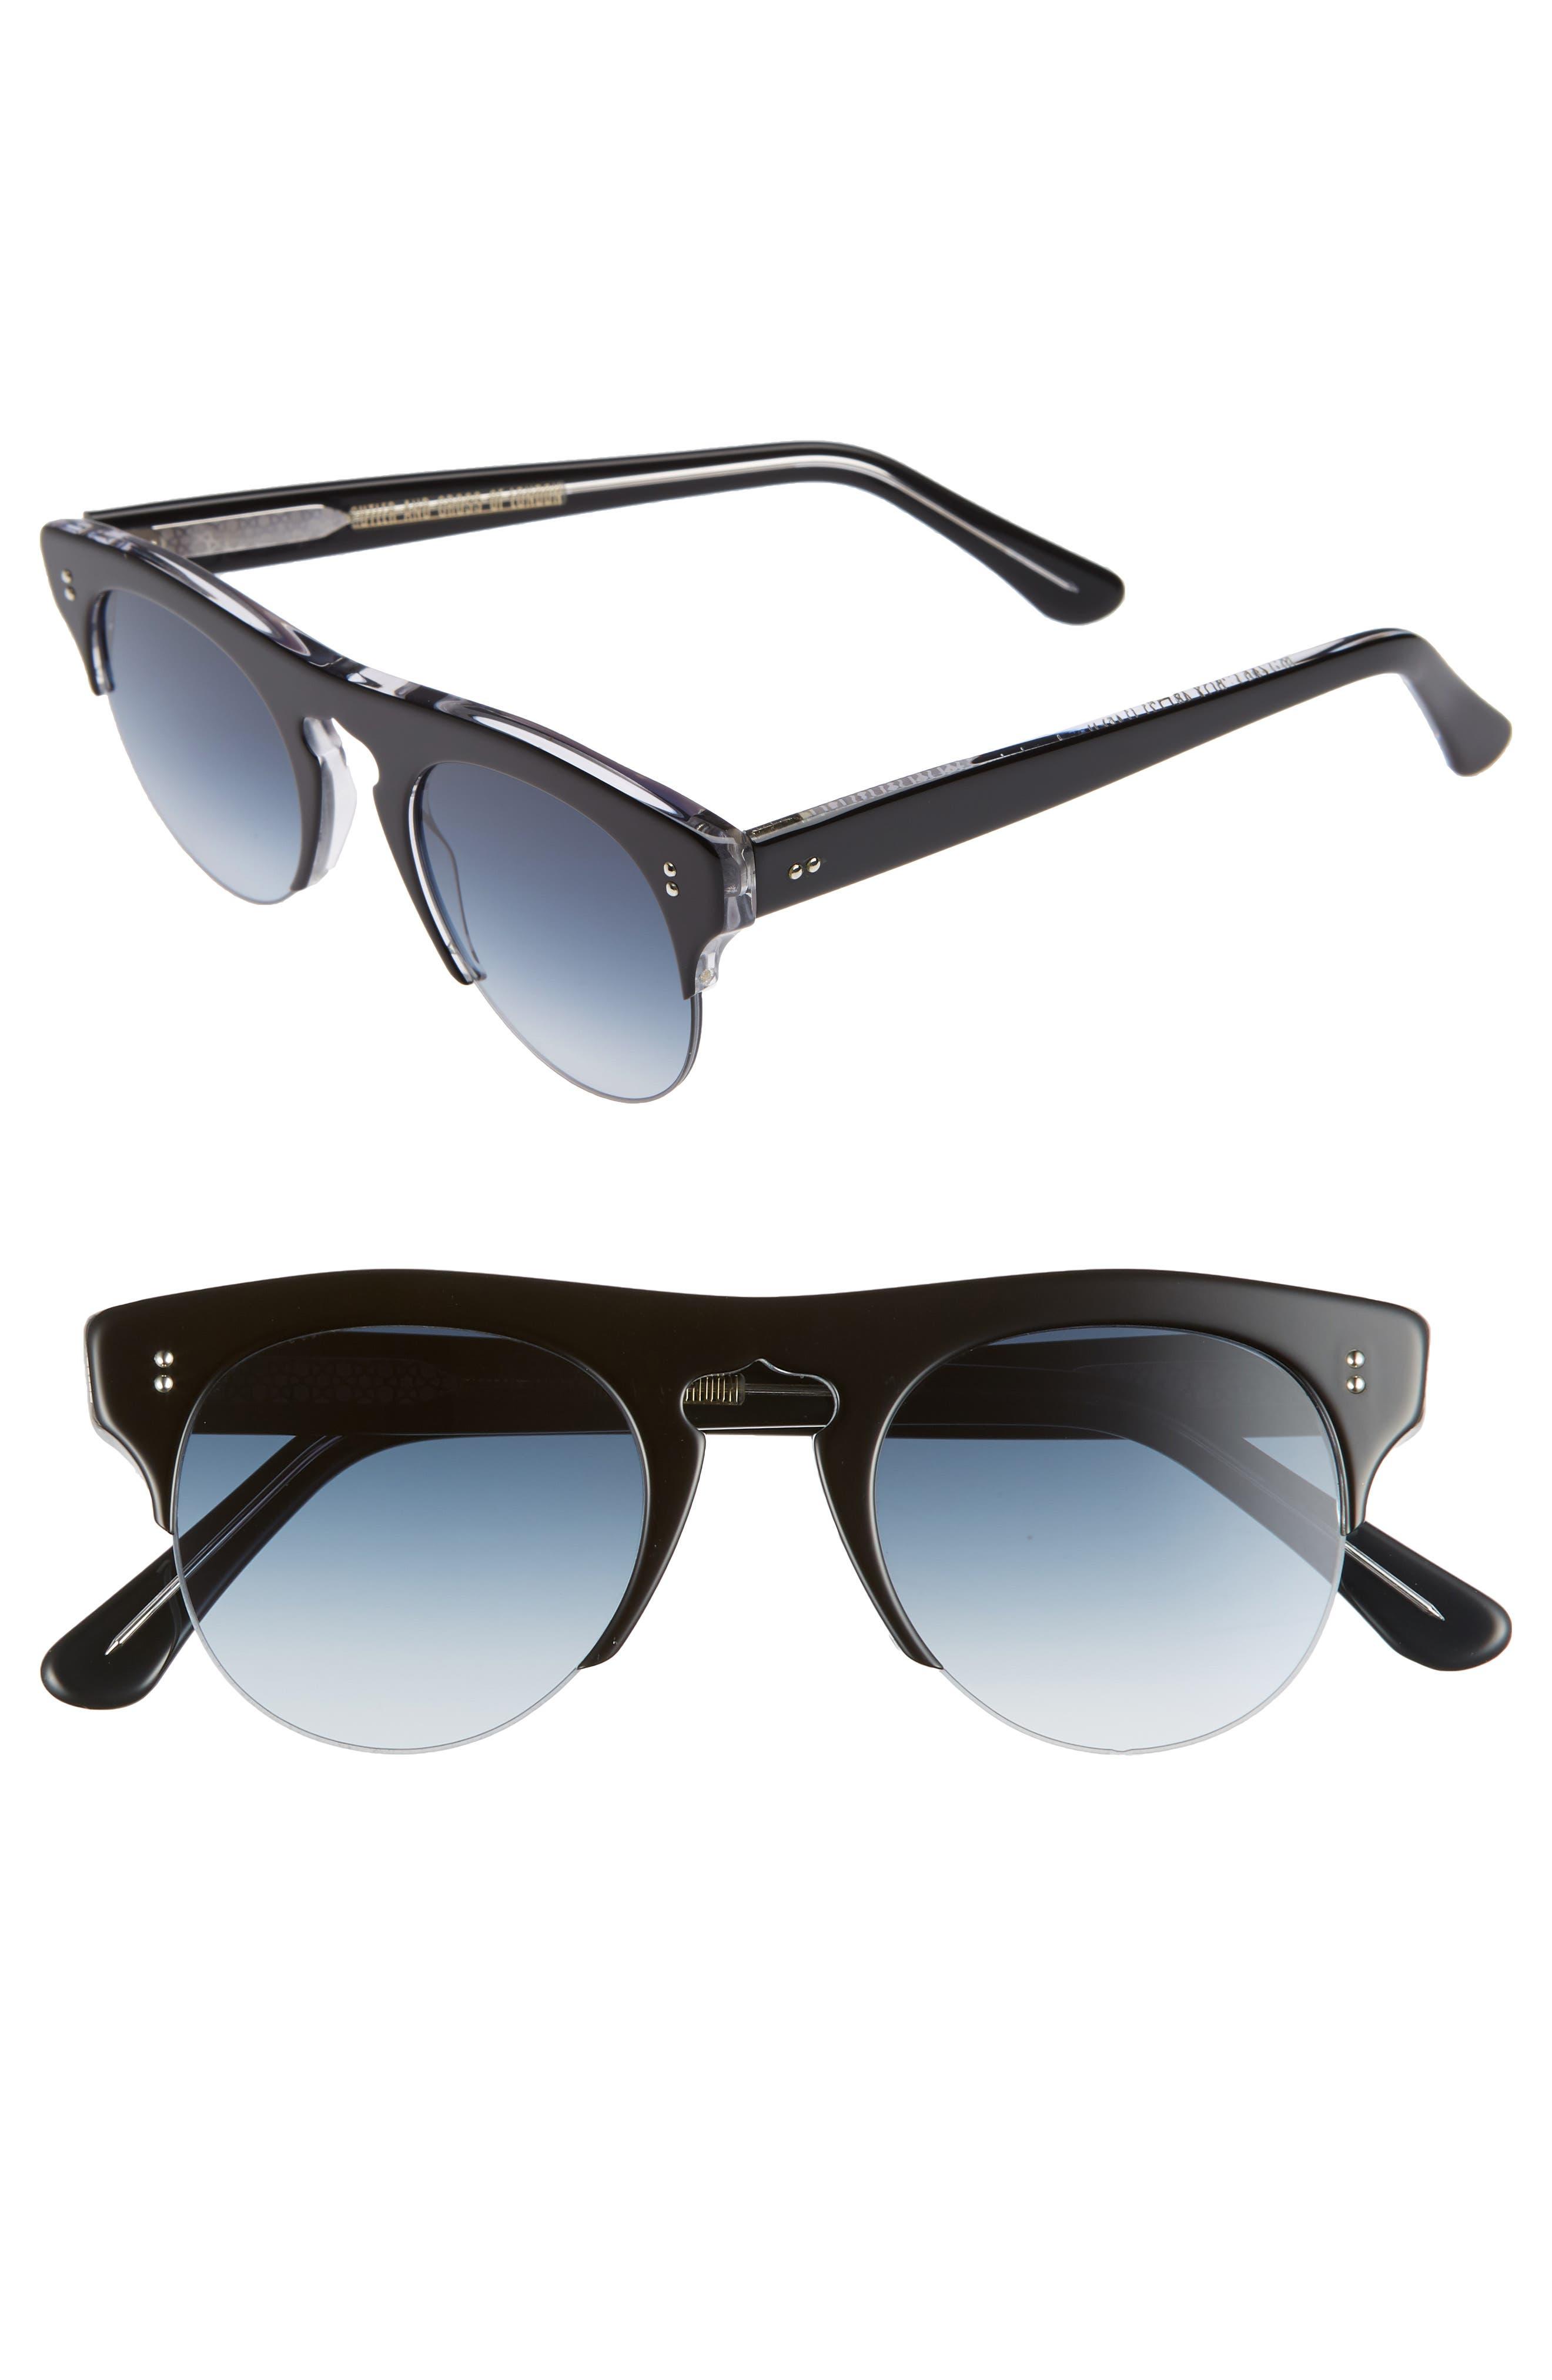 48mm Polarized Browline Sunglasses,                             Main thumbnail 1, color,                             BLACK ON CRYSTAL/ BLUE